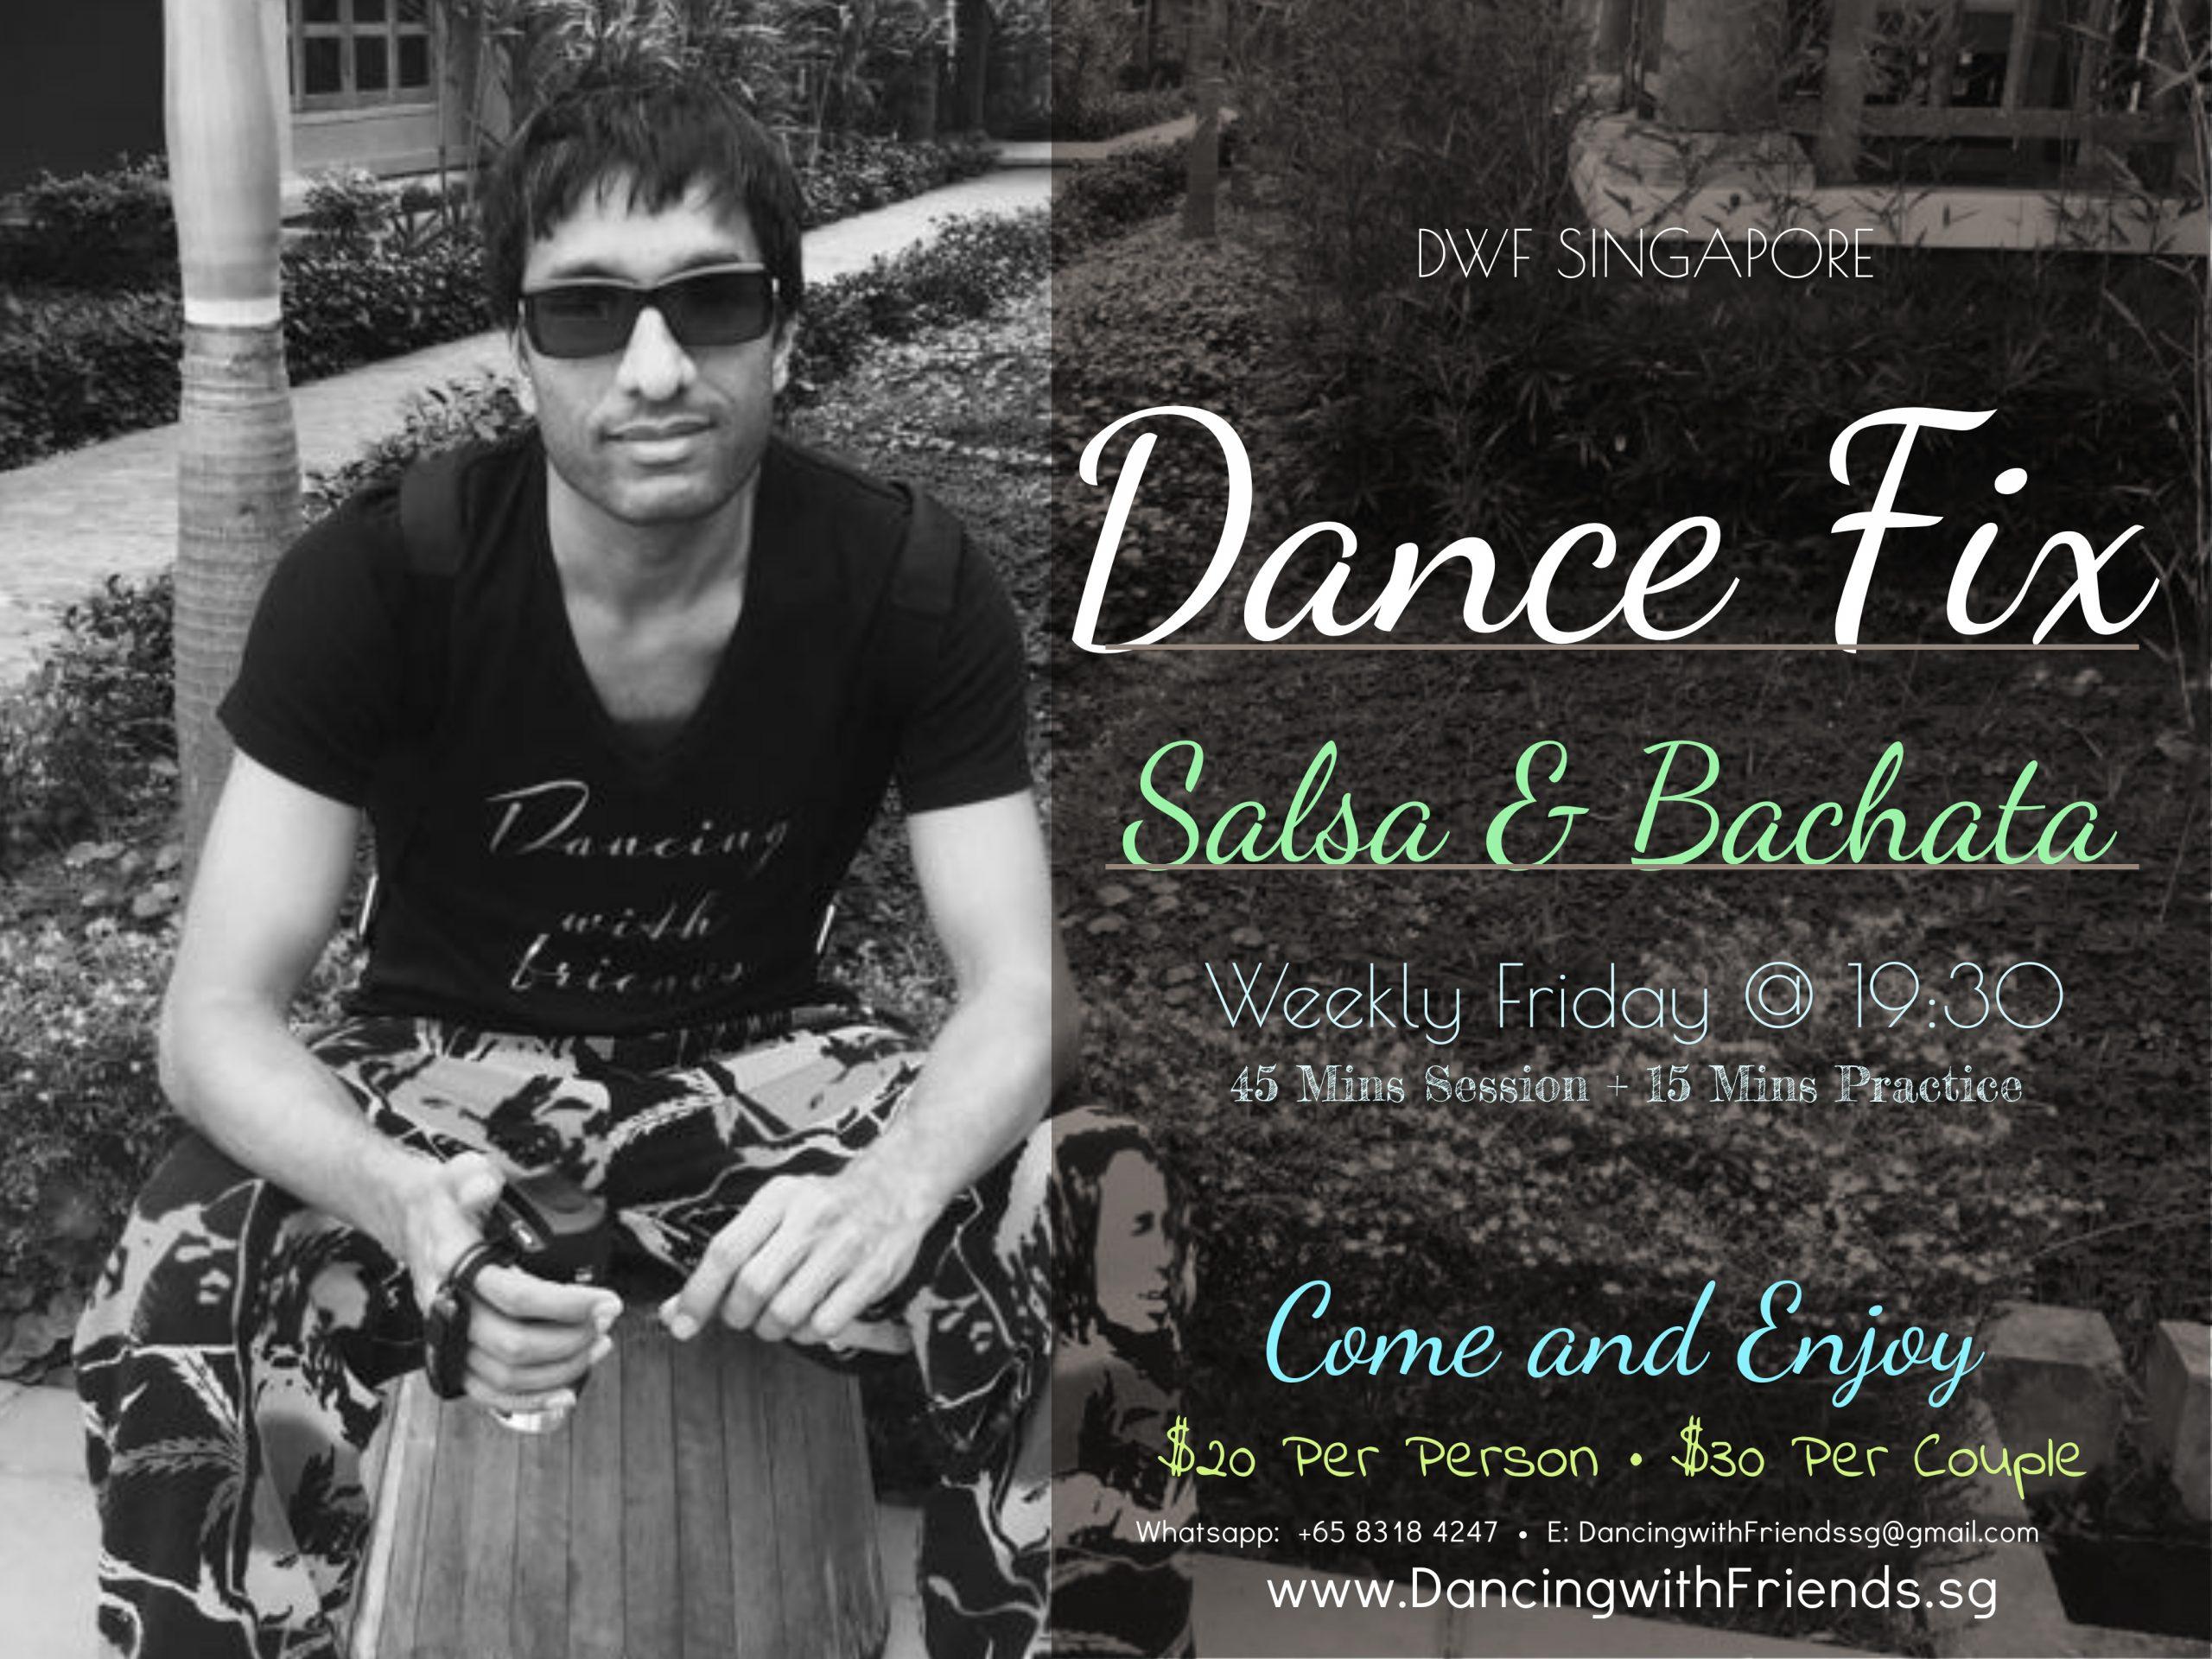 http://dancingwithfriends.sg/wp-content/uploads/2020/02/Dance-Fix-01-scaled.jpg